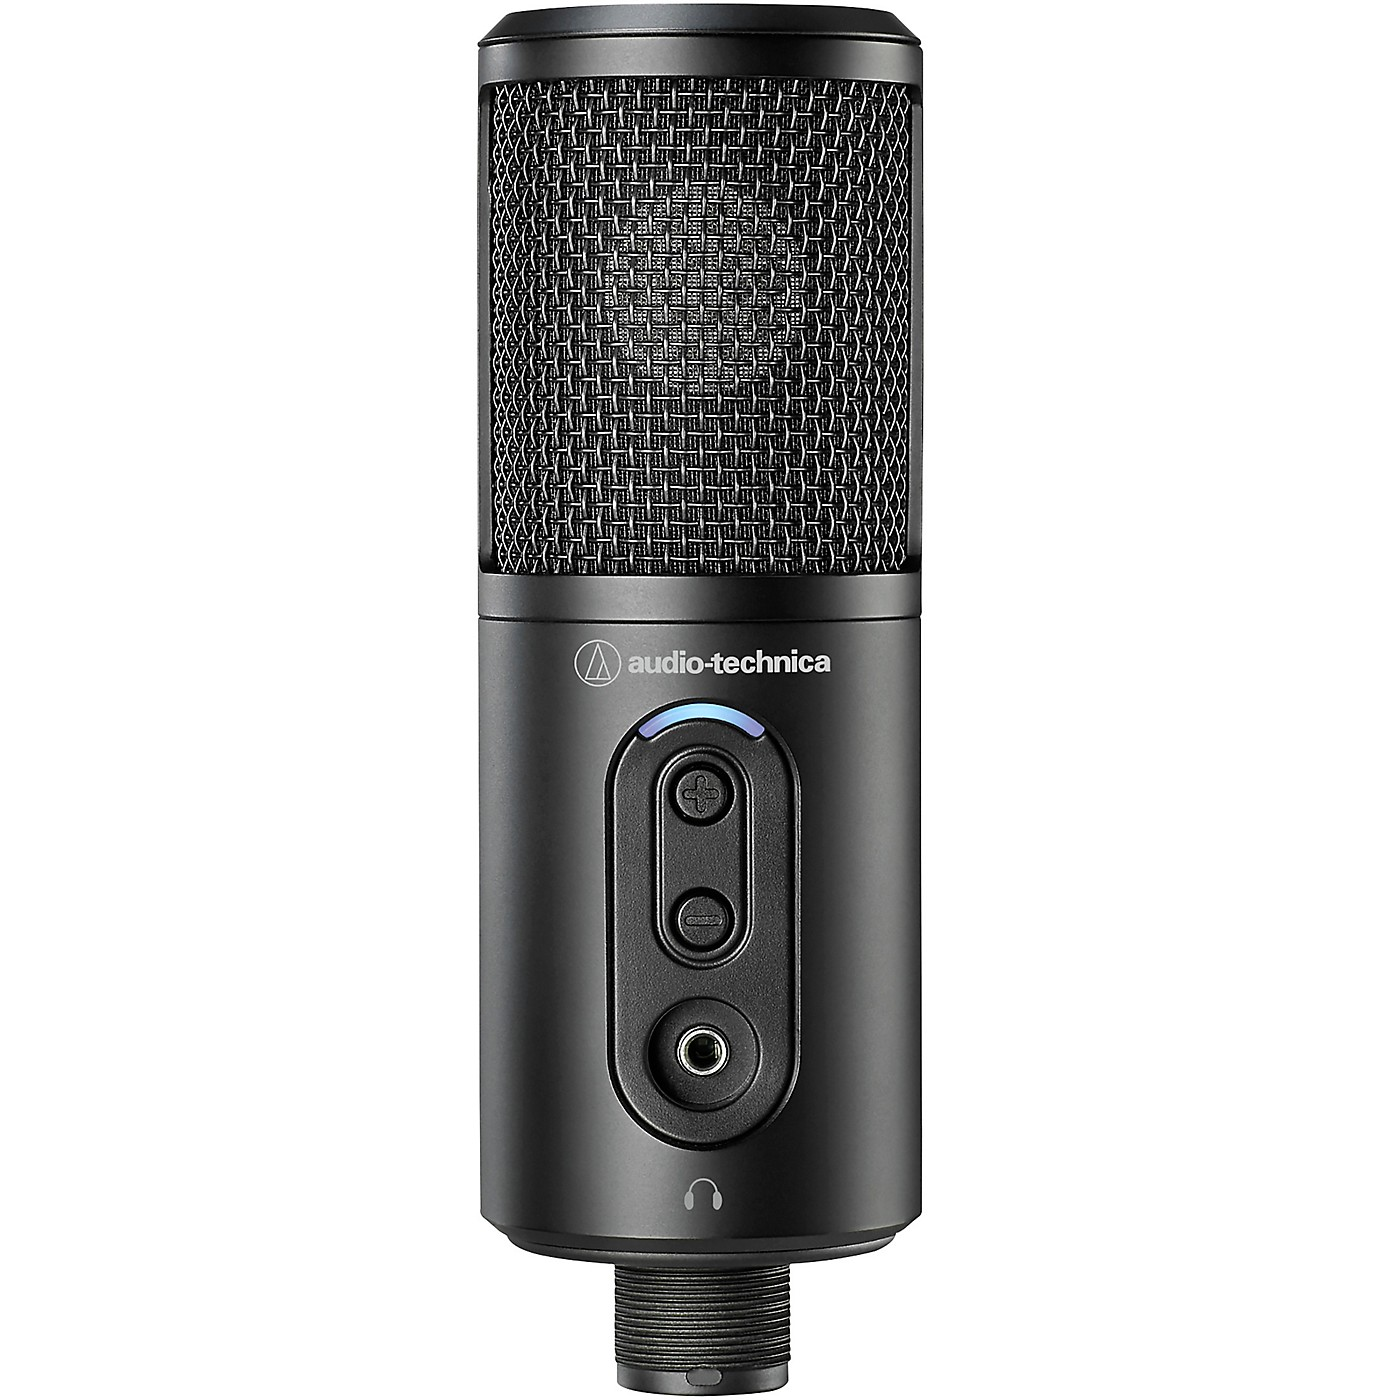 Audio-Technica ATR2500X-USB Cardioid Condenser USB Microphone thumbnail